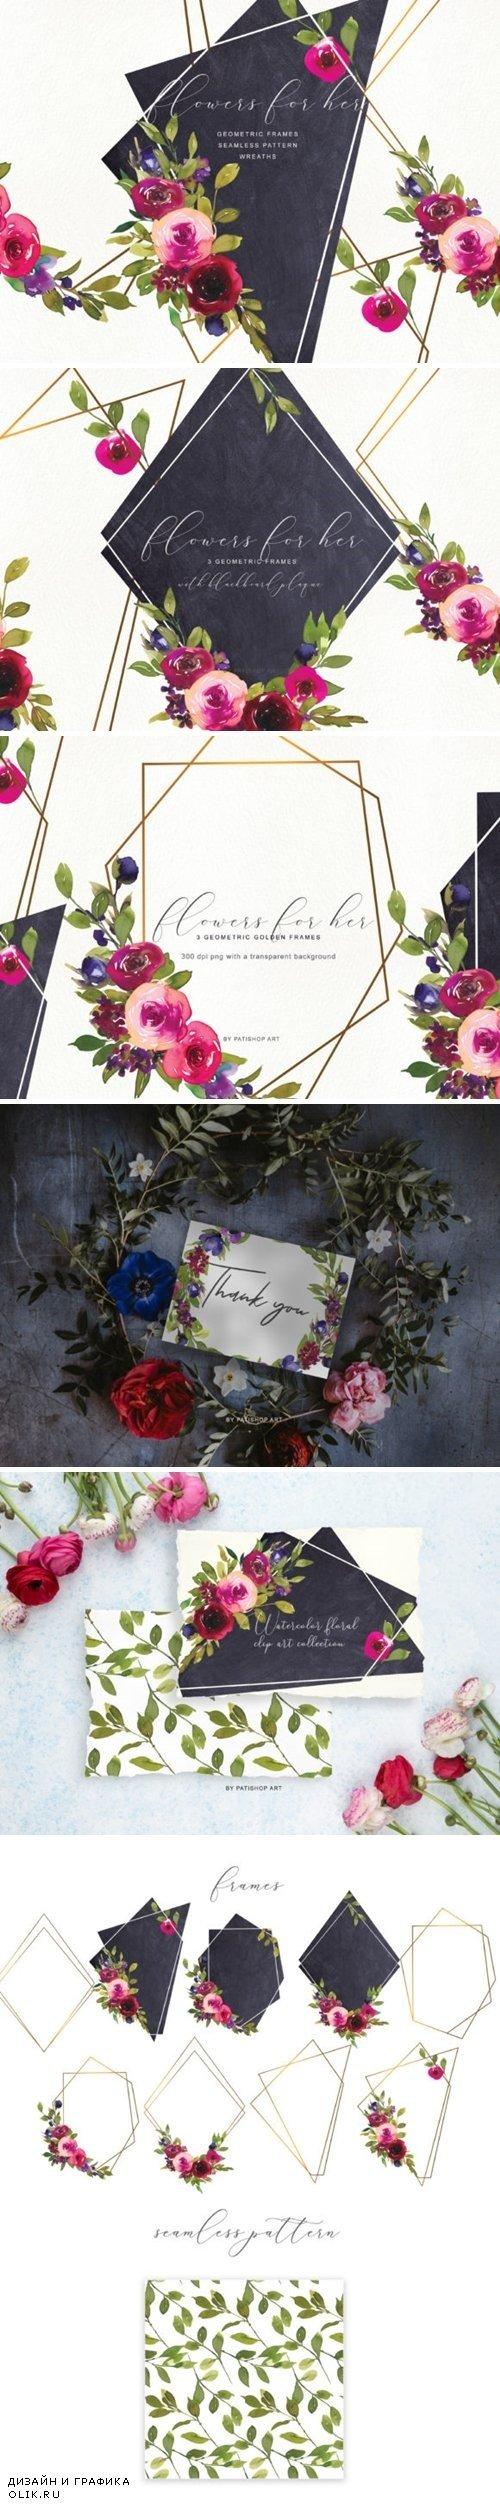 Watercolor Rose Frame & Wreath Set - 3957874